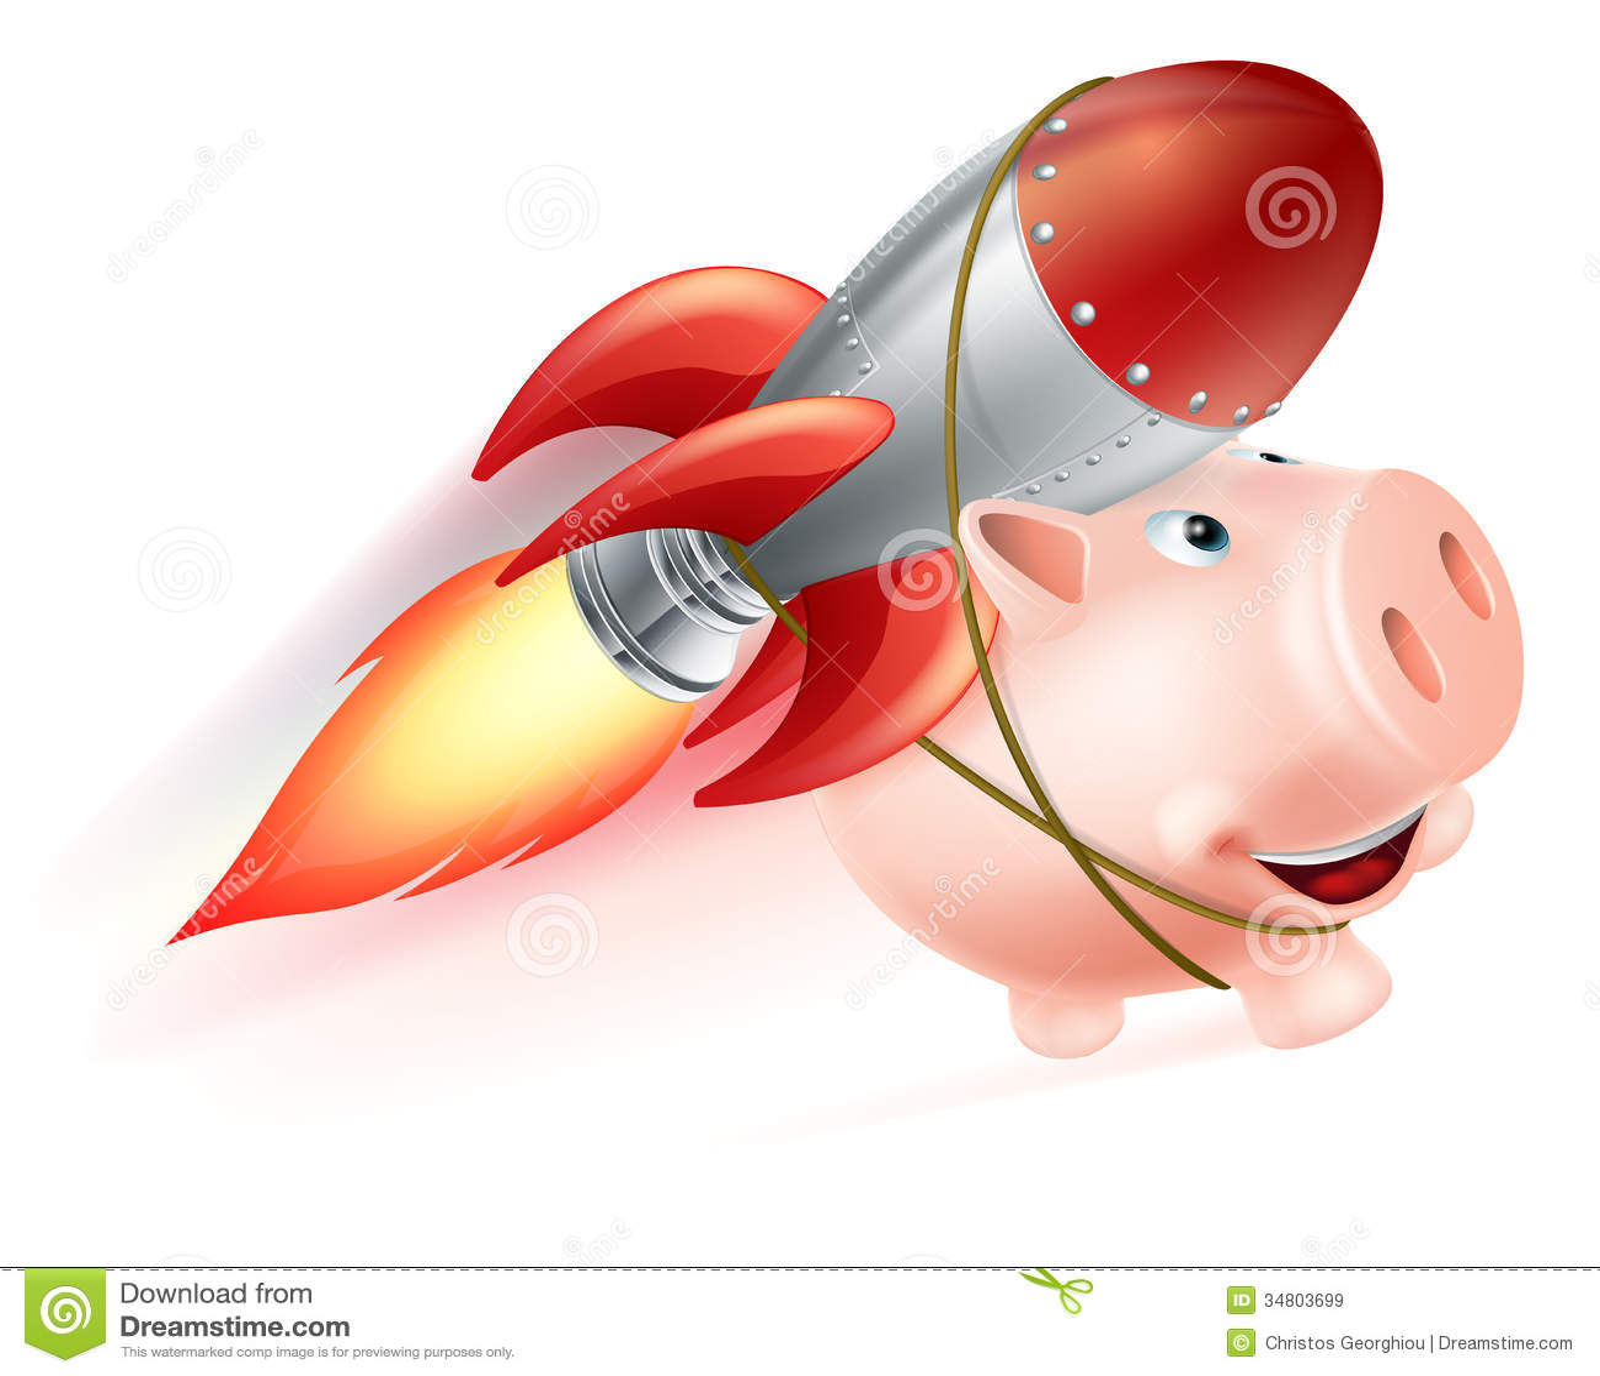 Rocket Piggy Bank Royalty Free Stock Images Image 34803699